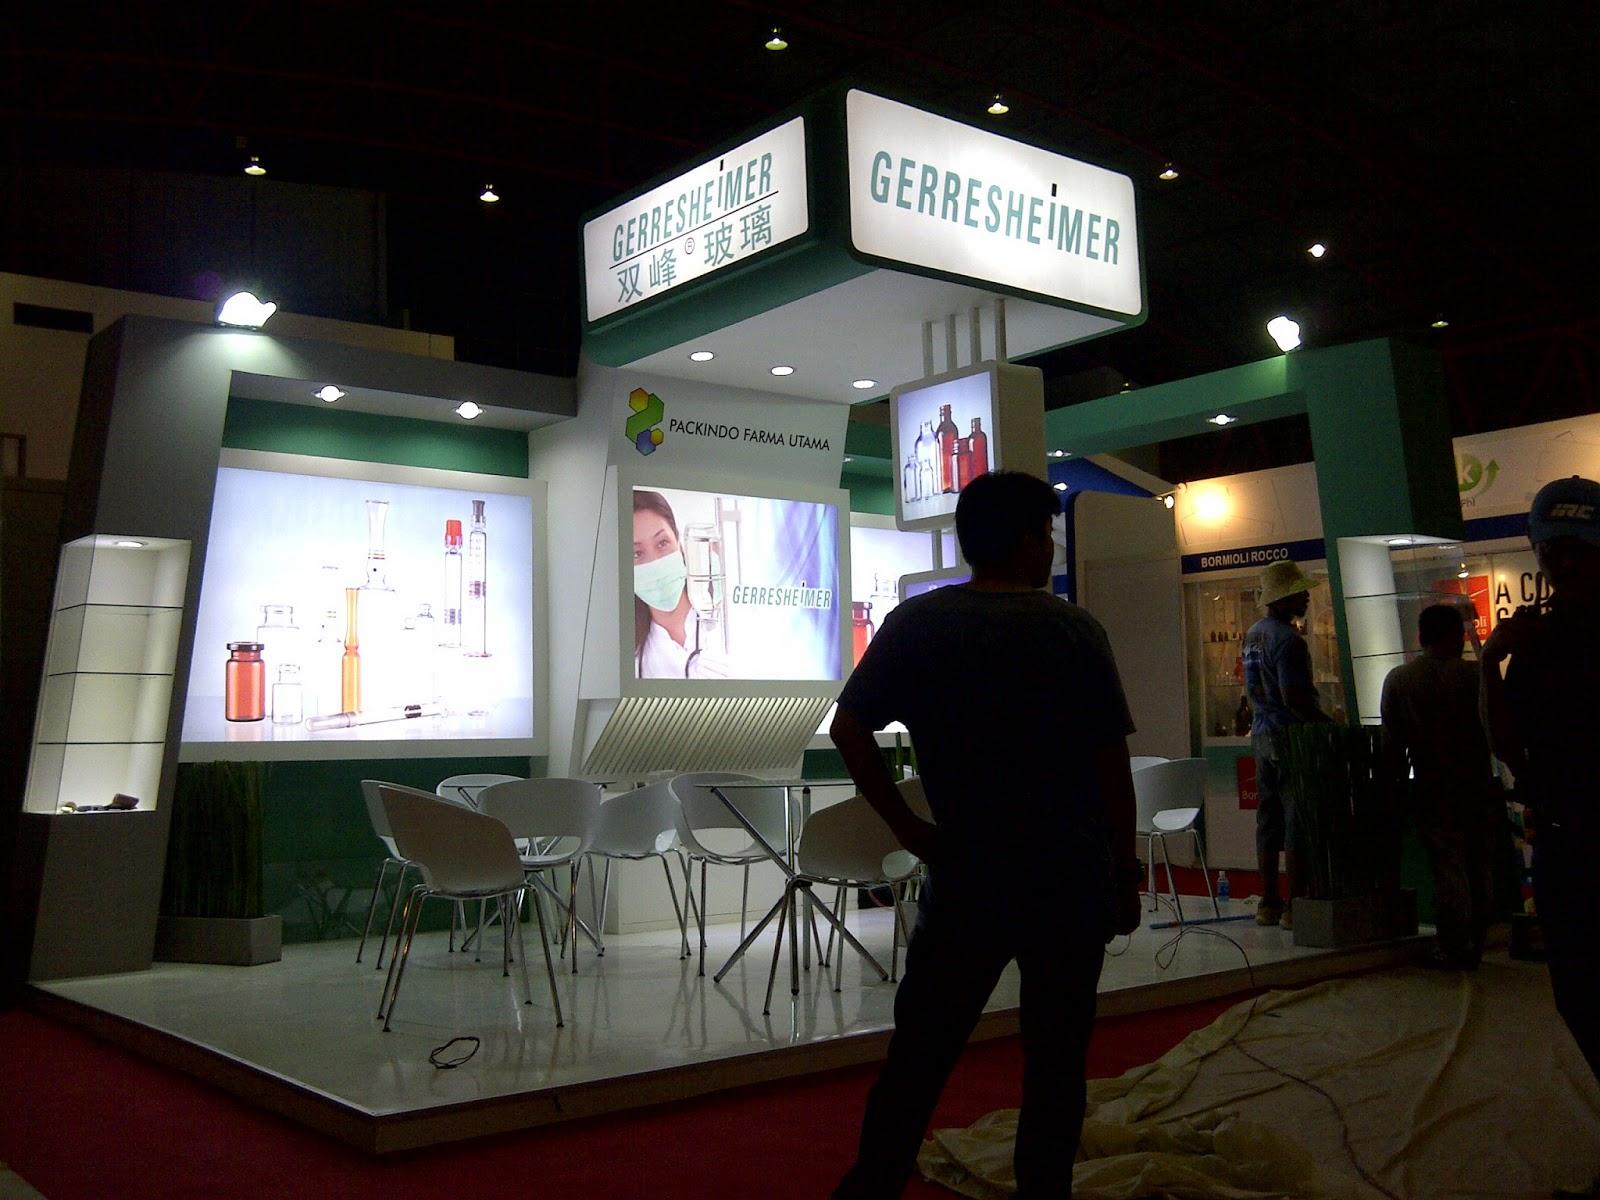 Exhibition Booth Height : Exhibiton booths: exhibition design & build